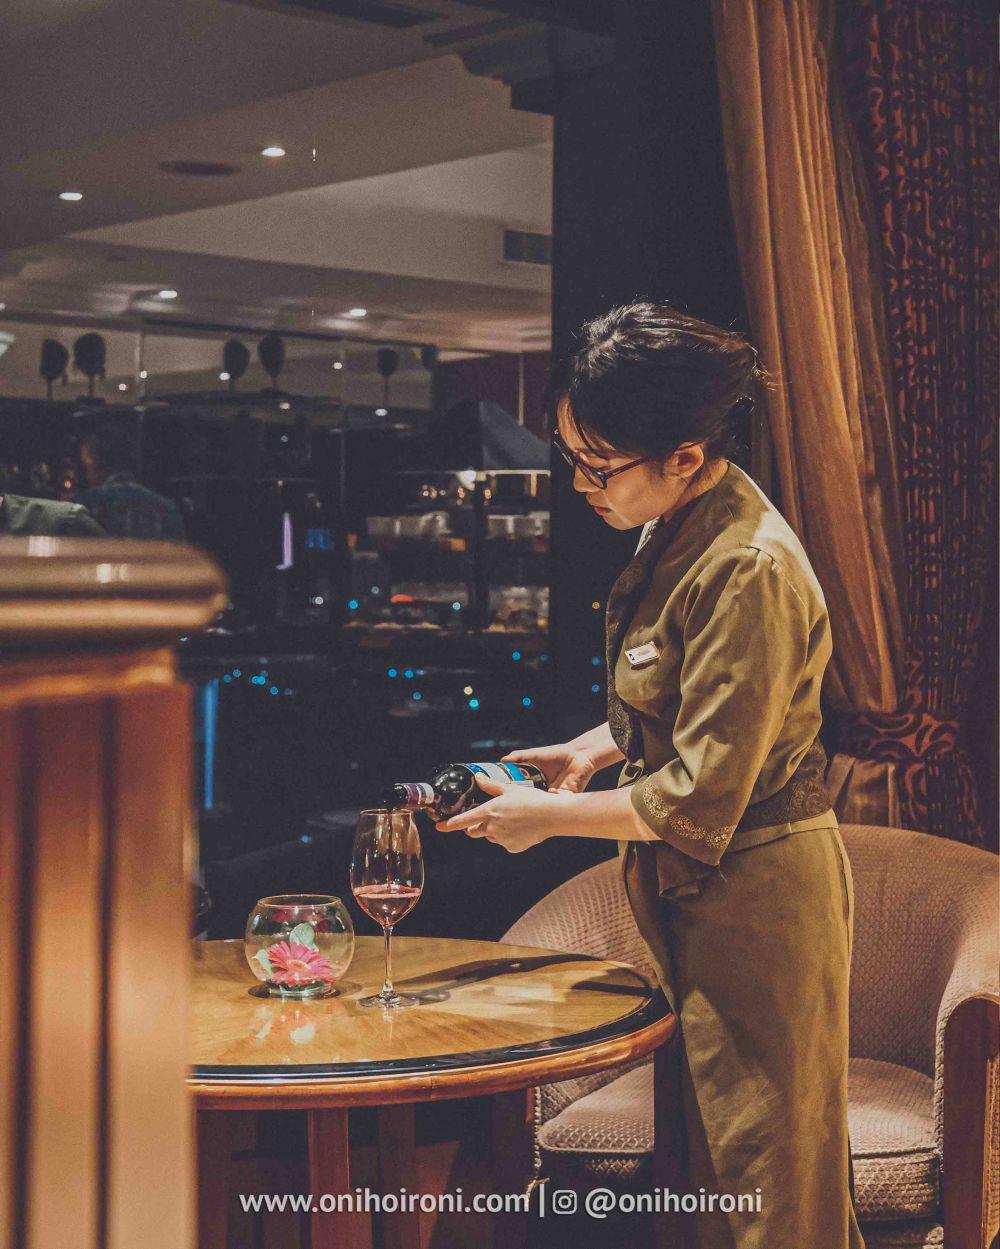 1 Review Evening Cocktail Horizon Club Lounge Shangrila Surabaya Hotel Oni hoironi